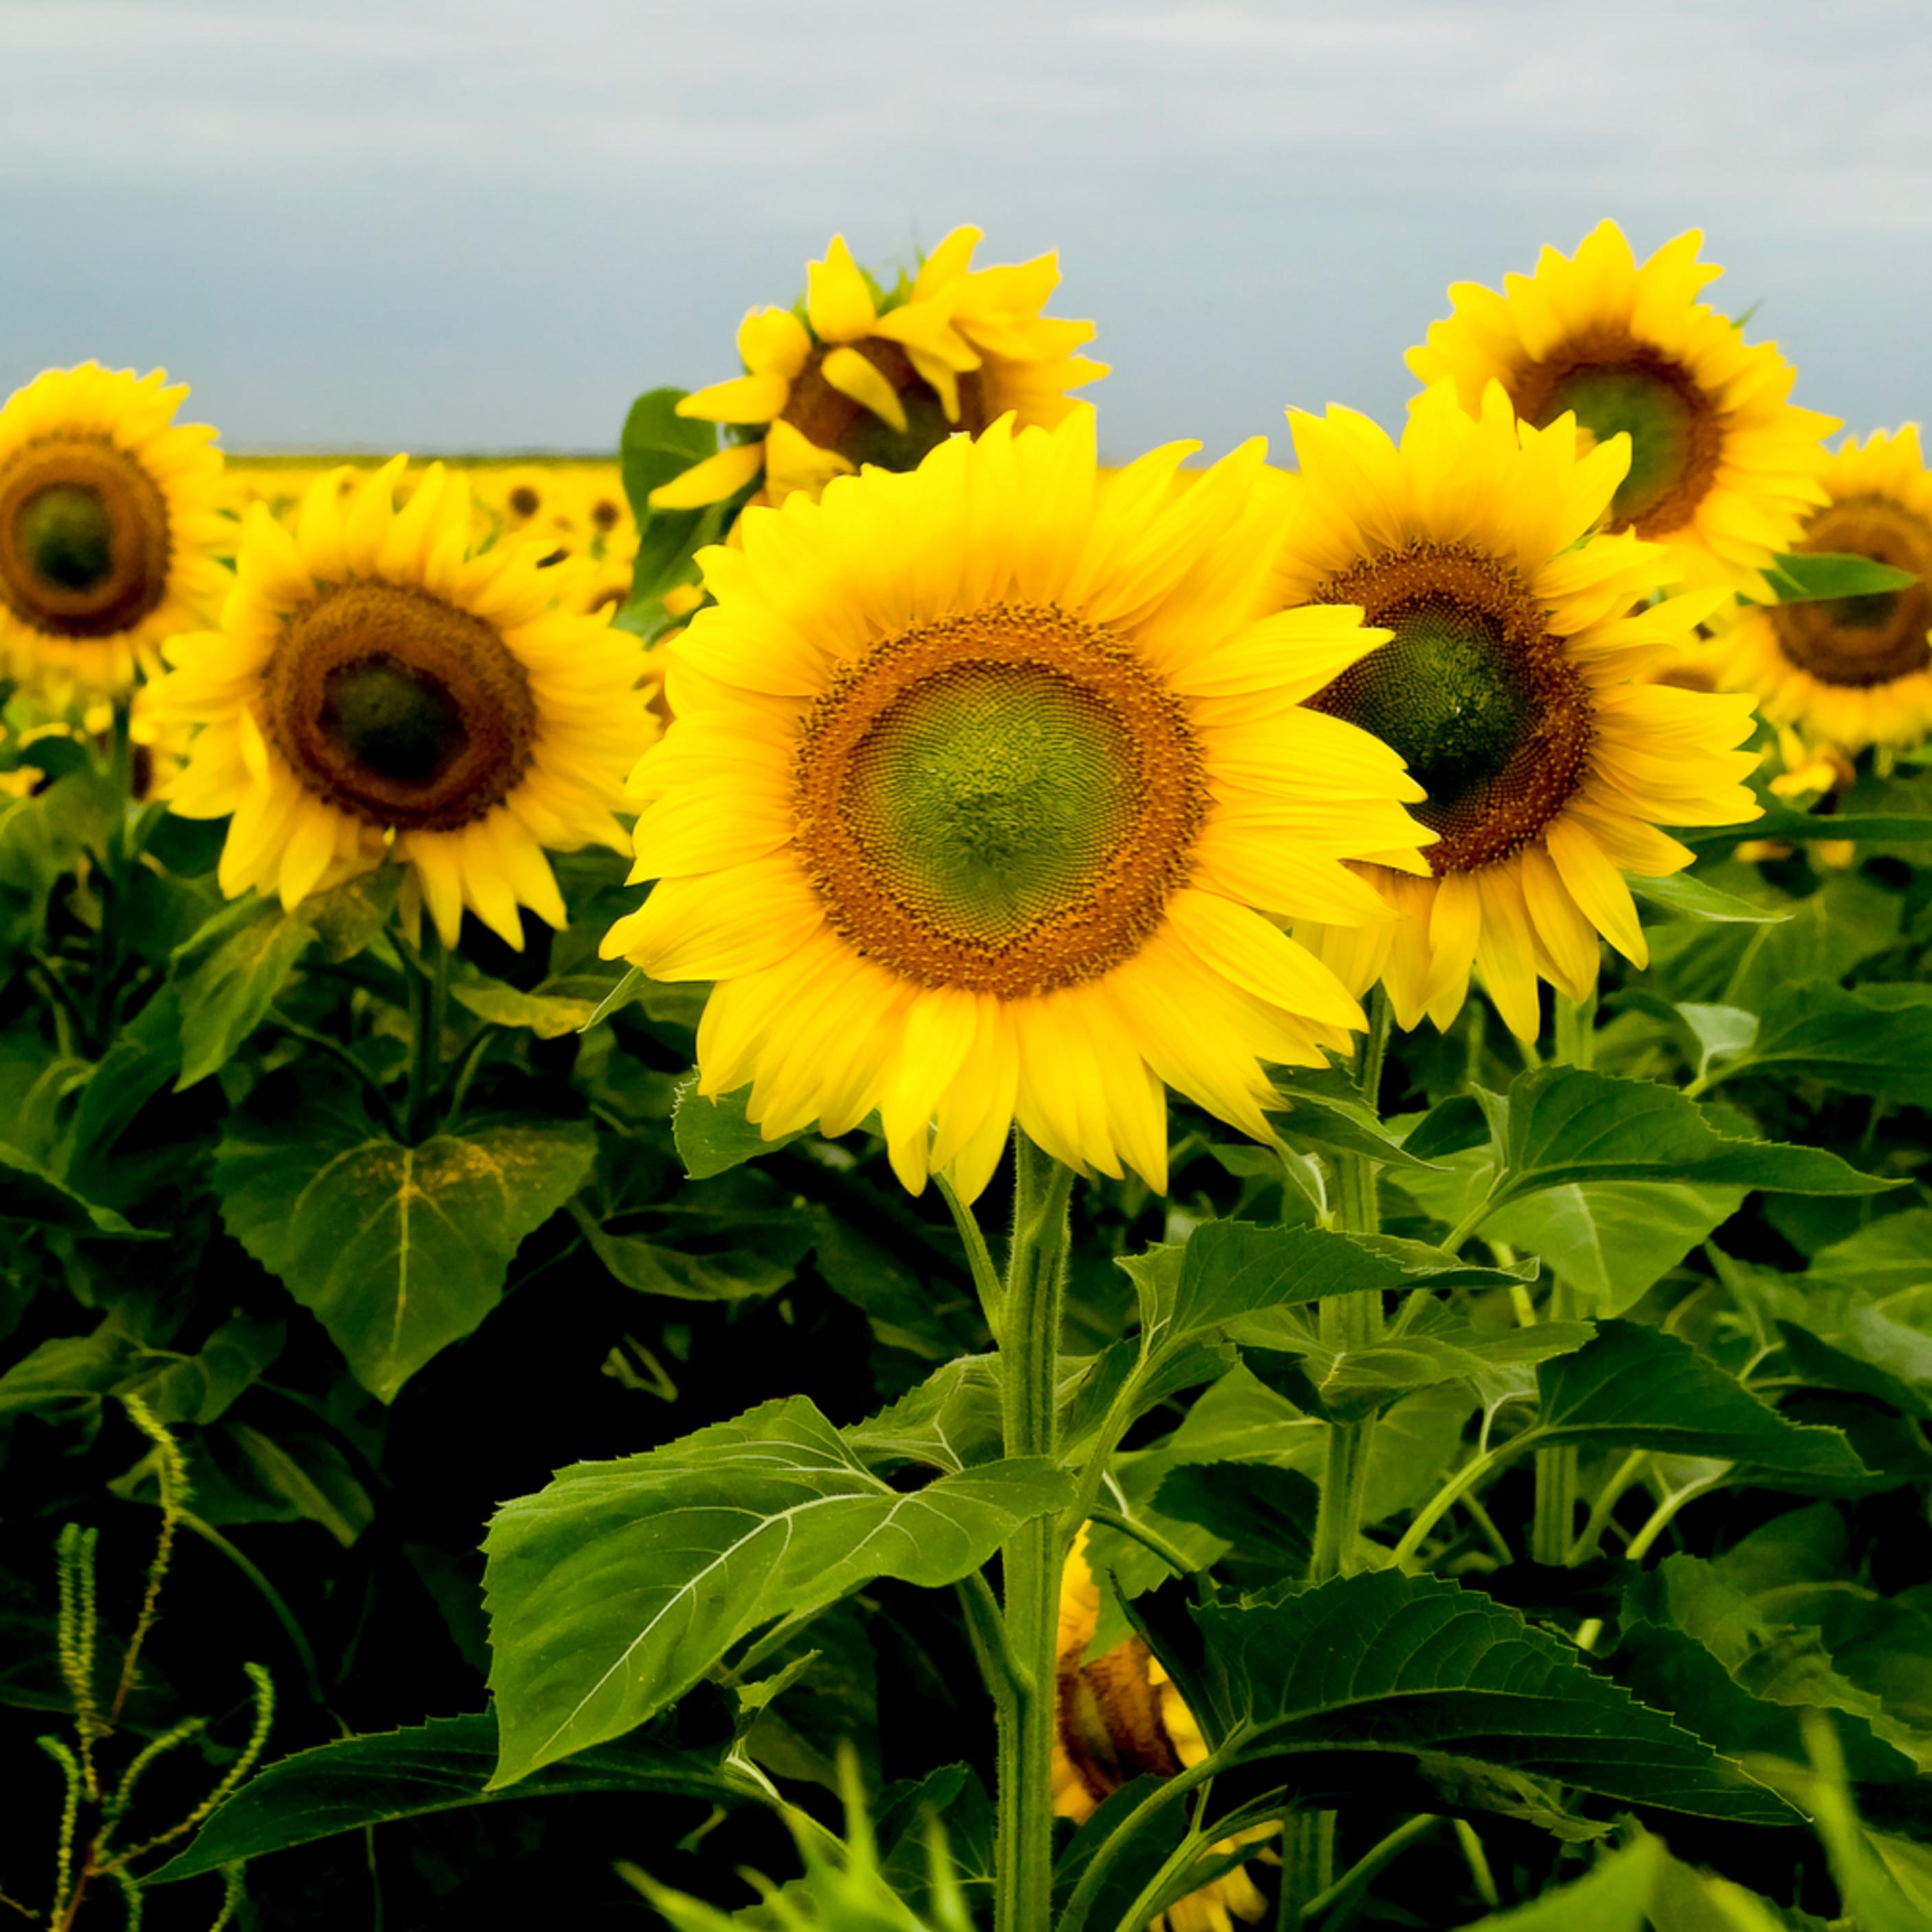 Sunflowers adjusted cabji3